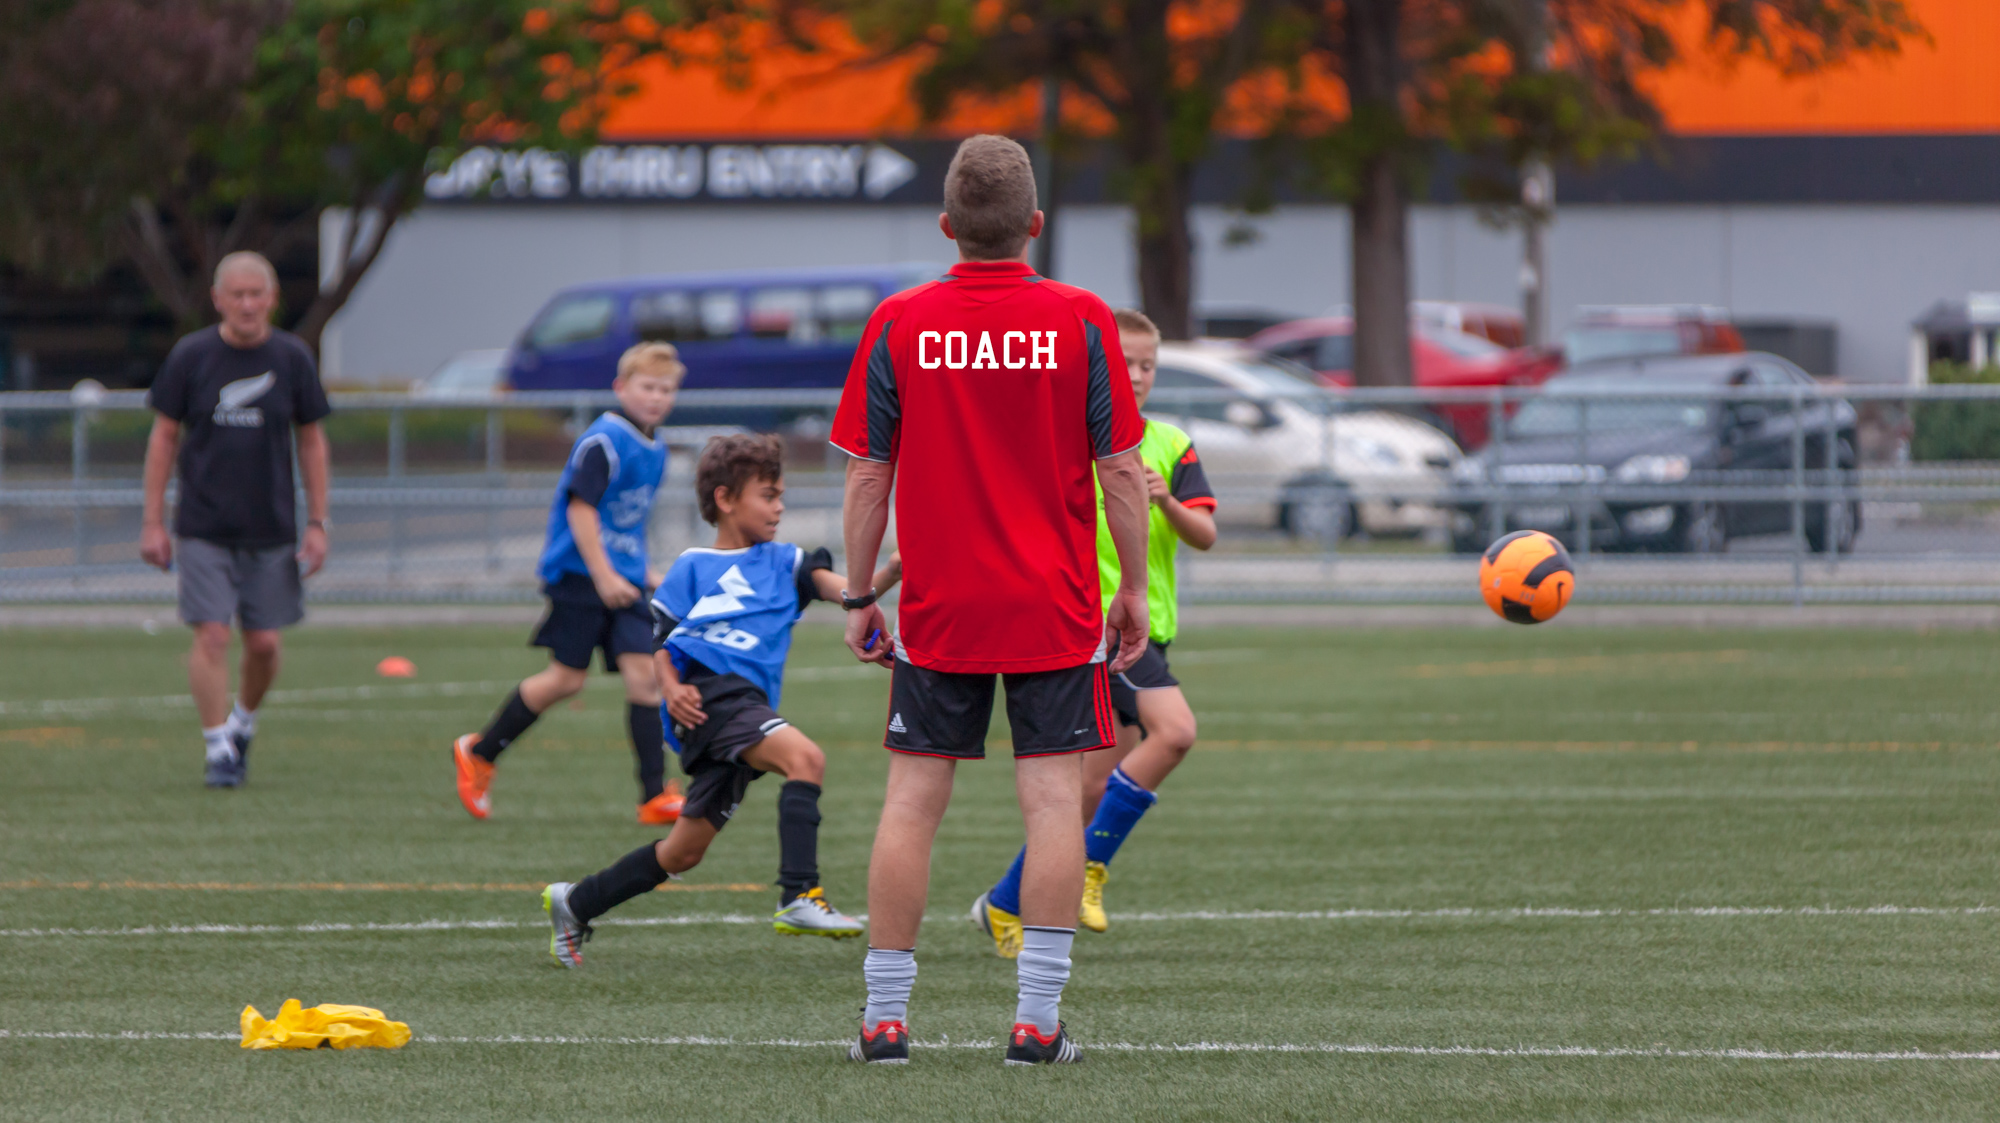 UHCC Soccer Coach 4474-Edit